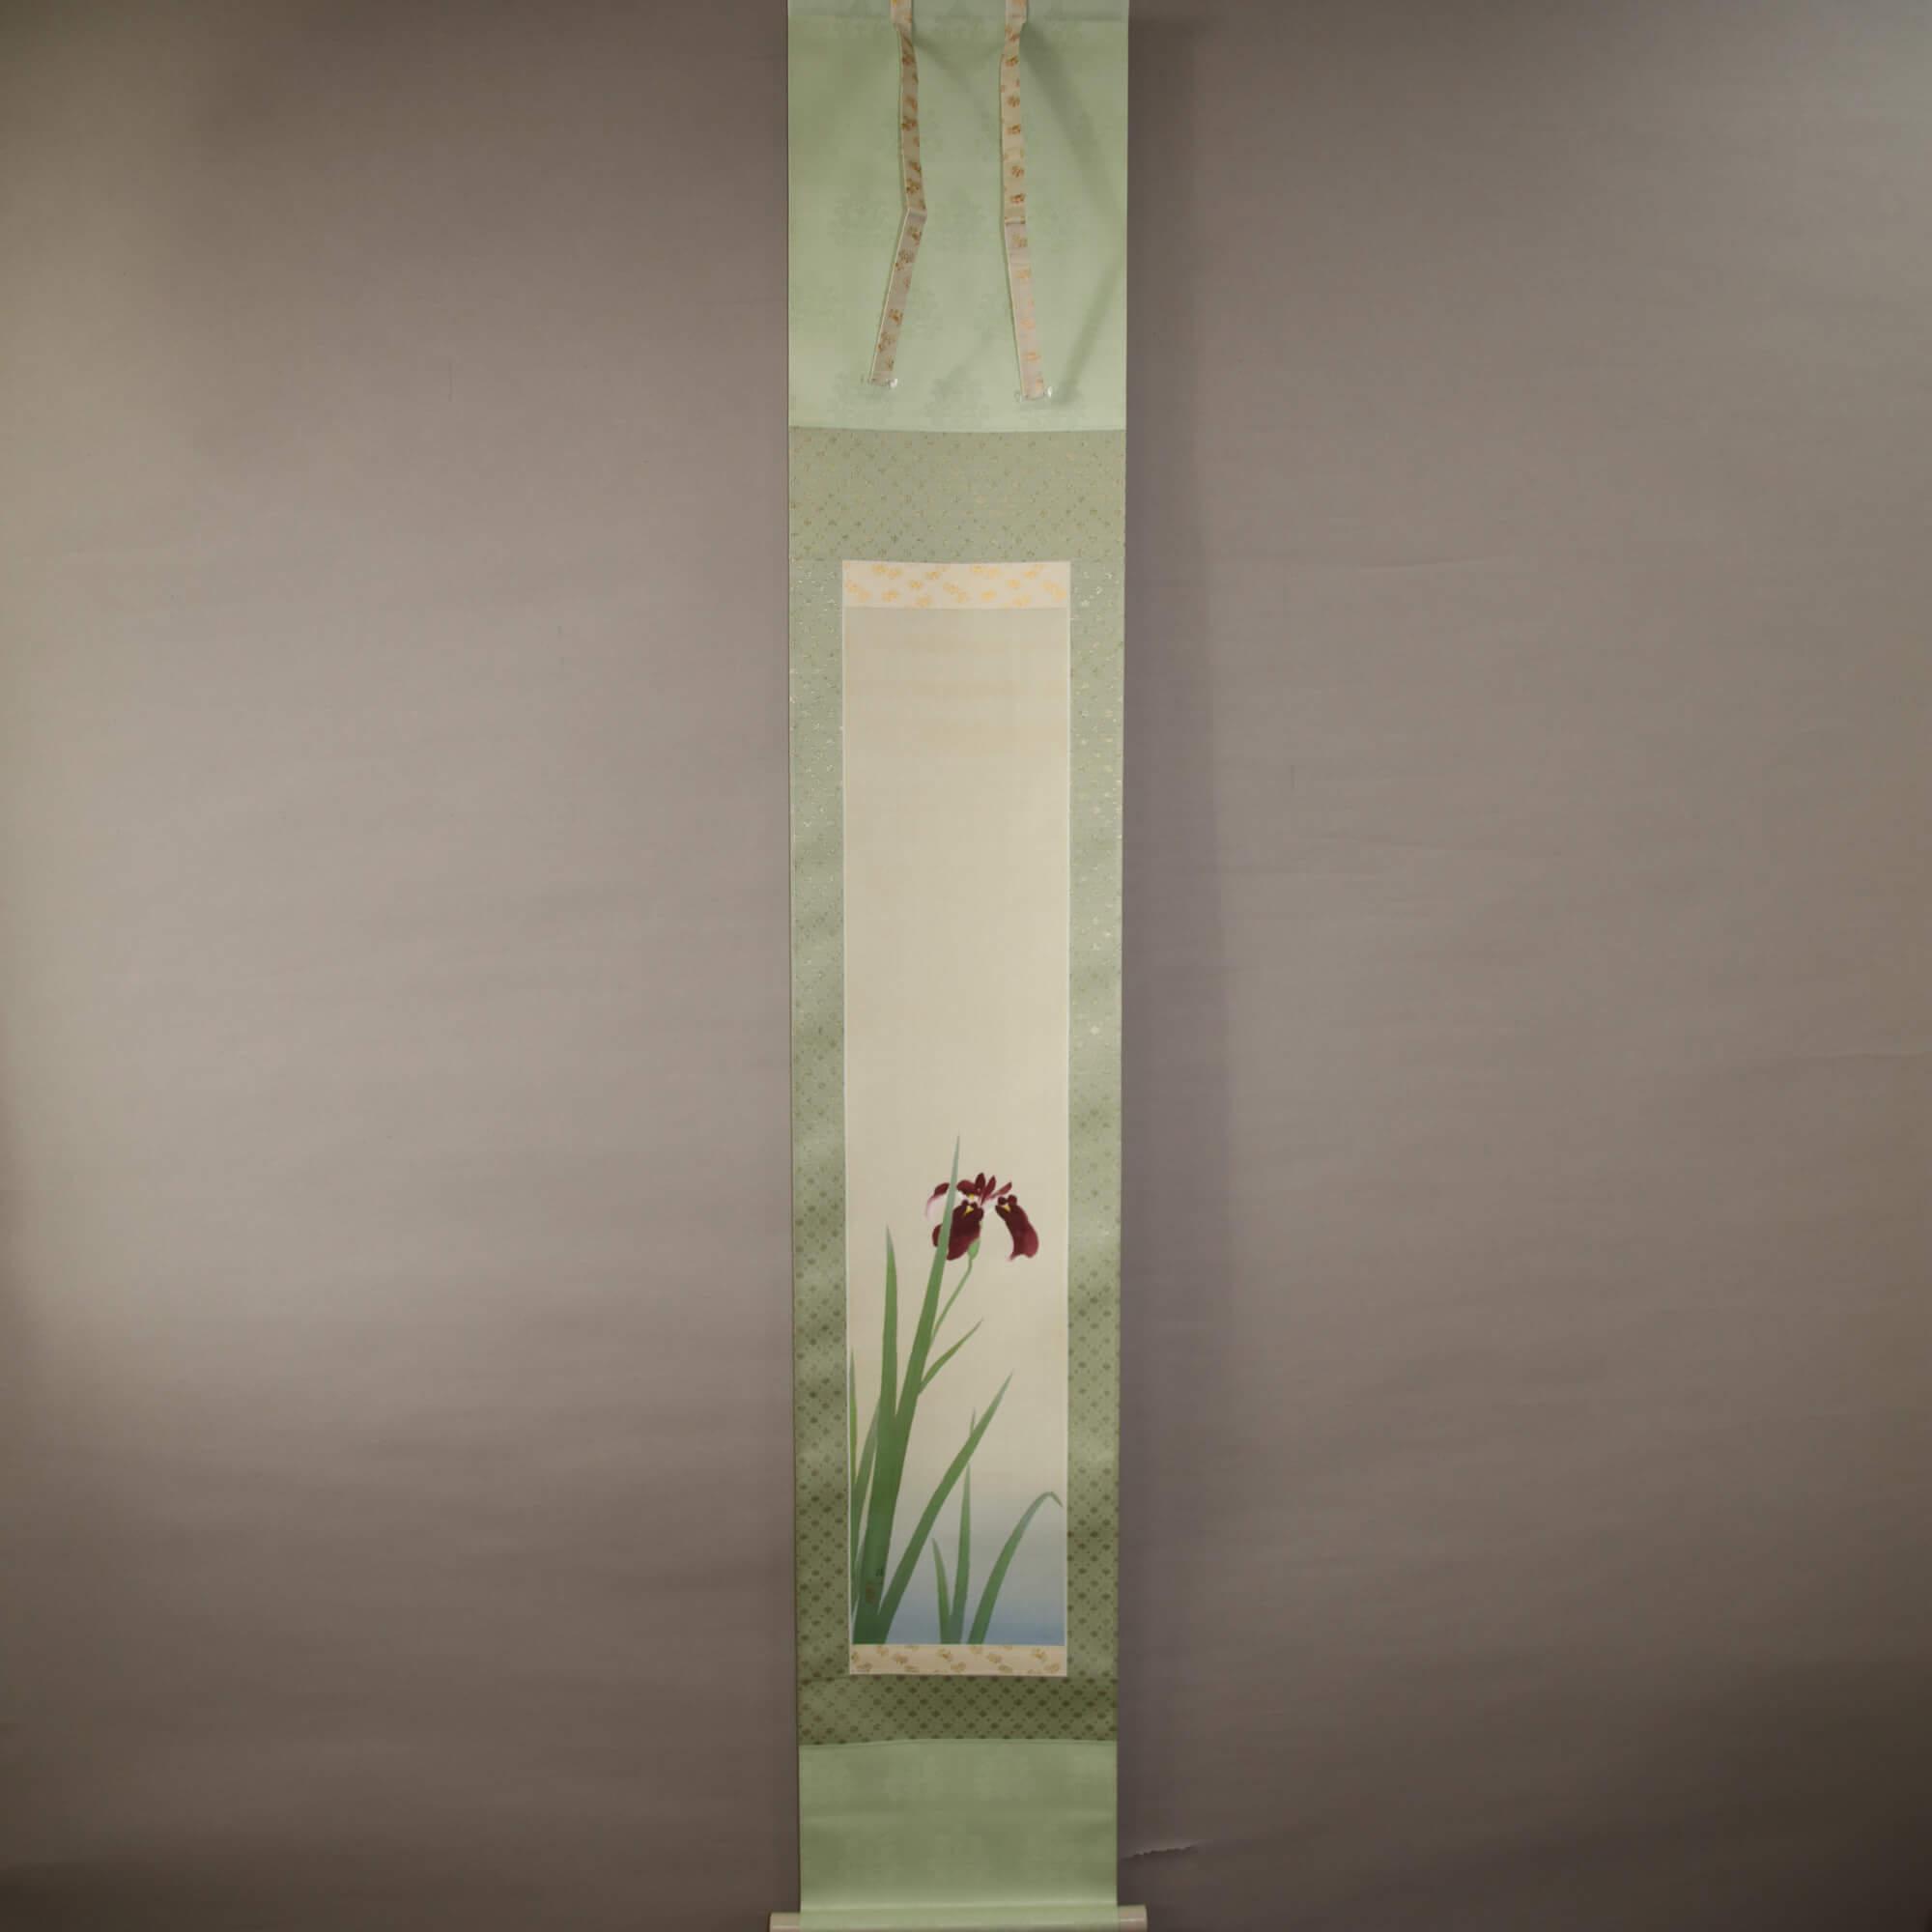 Japanese Irises / Hirai Baisen